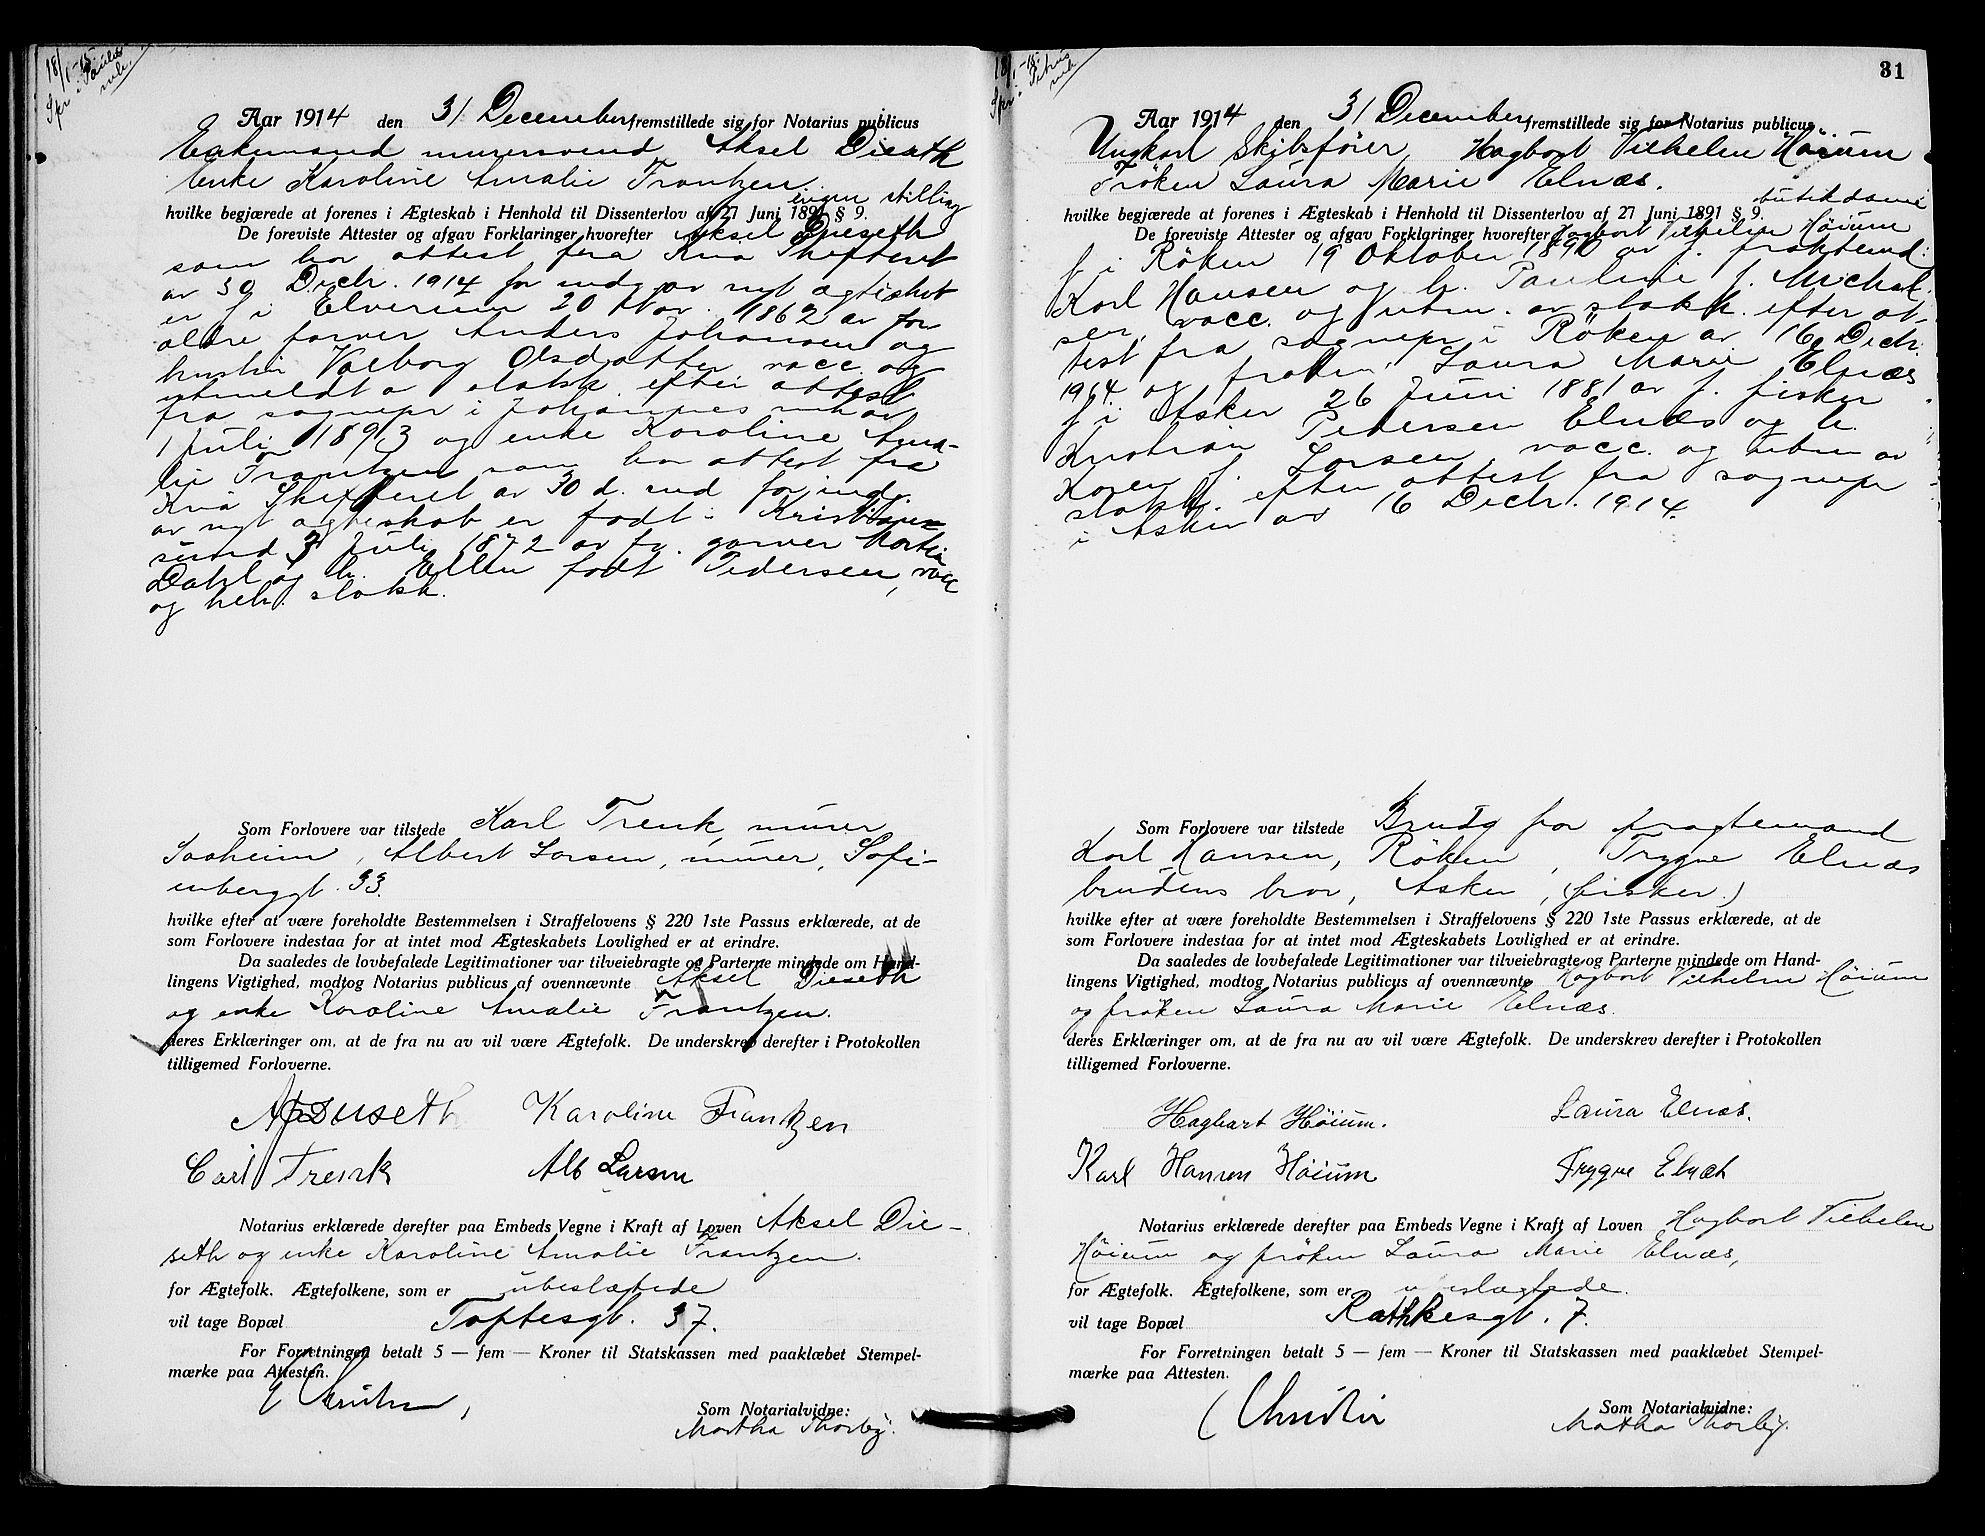 SAO, Oslo byfogd avd. I, L/Lb/Lbb/L0010: Notarialprotokoll, rekke II: Vigsler, 1914-1916, p. 30b-31a